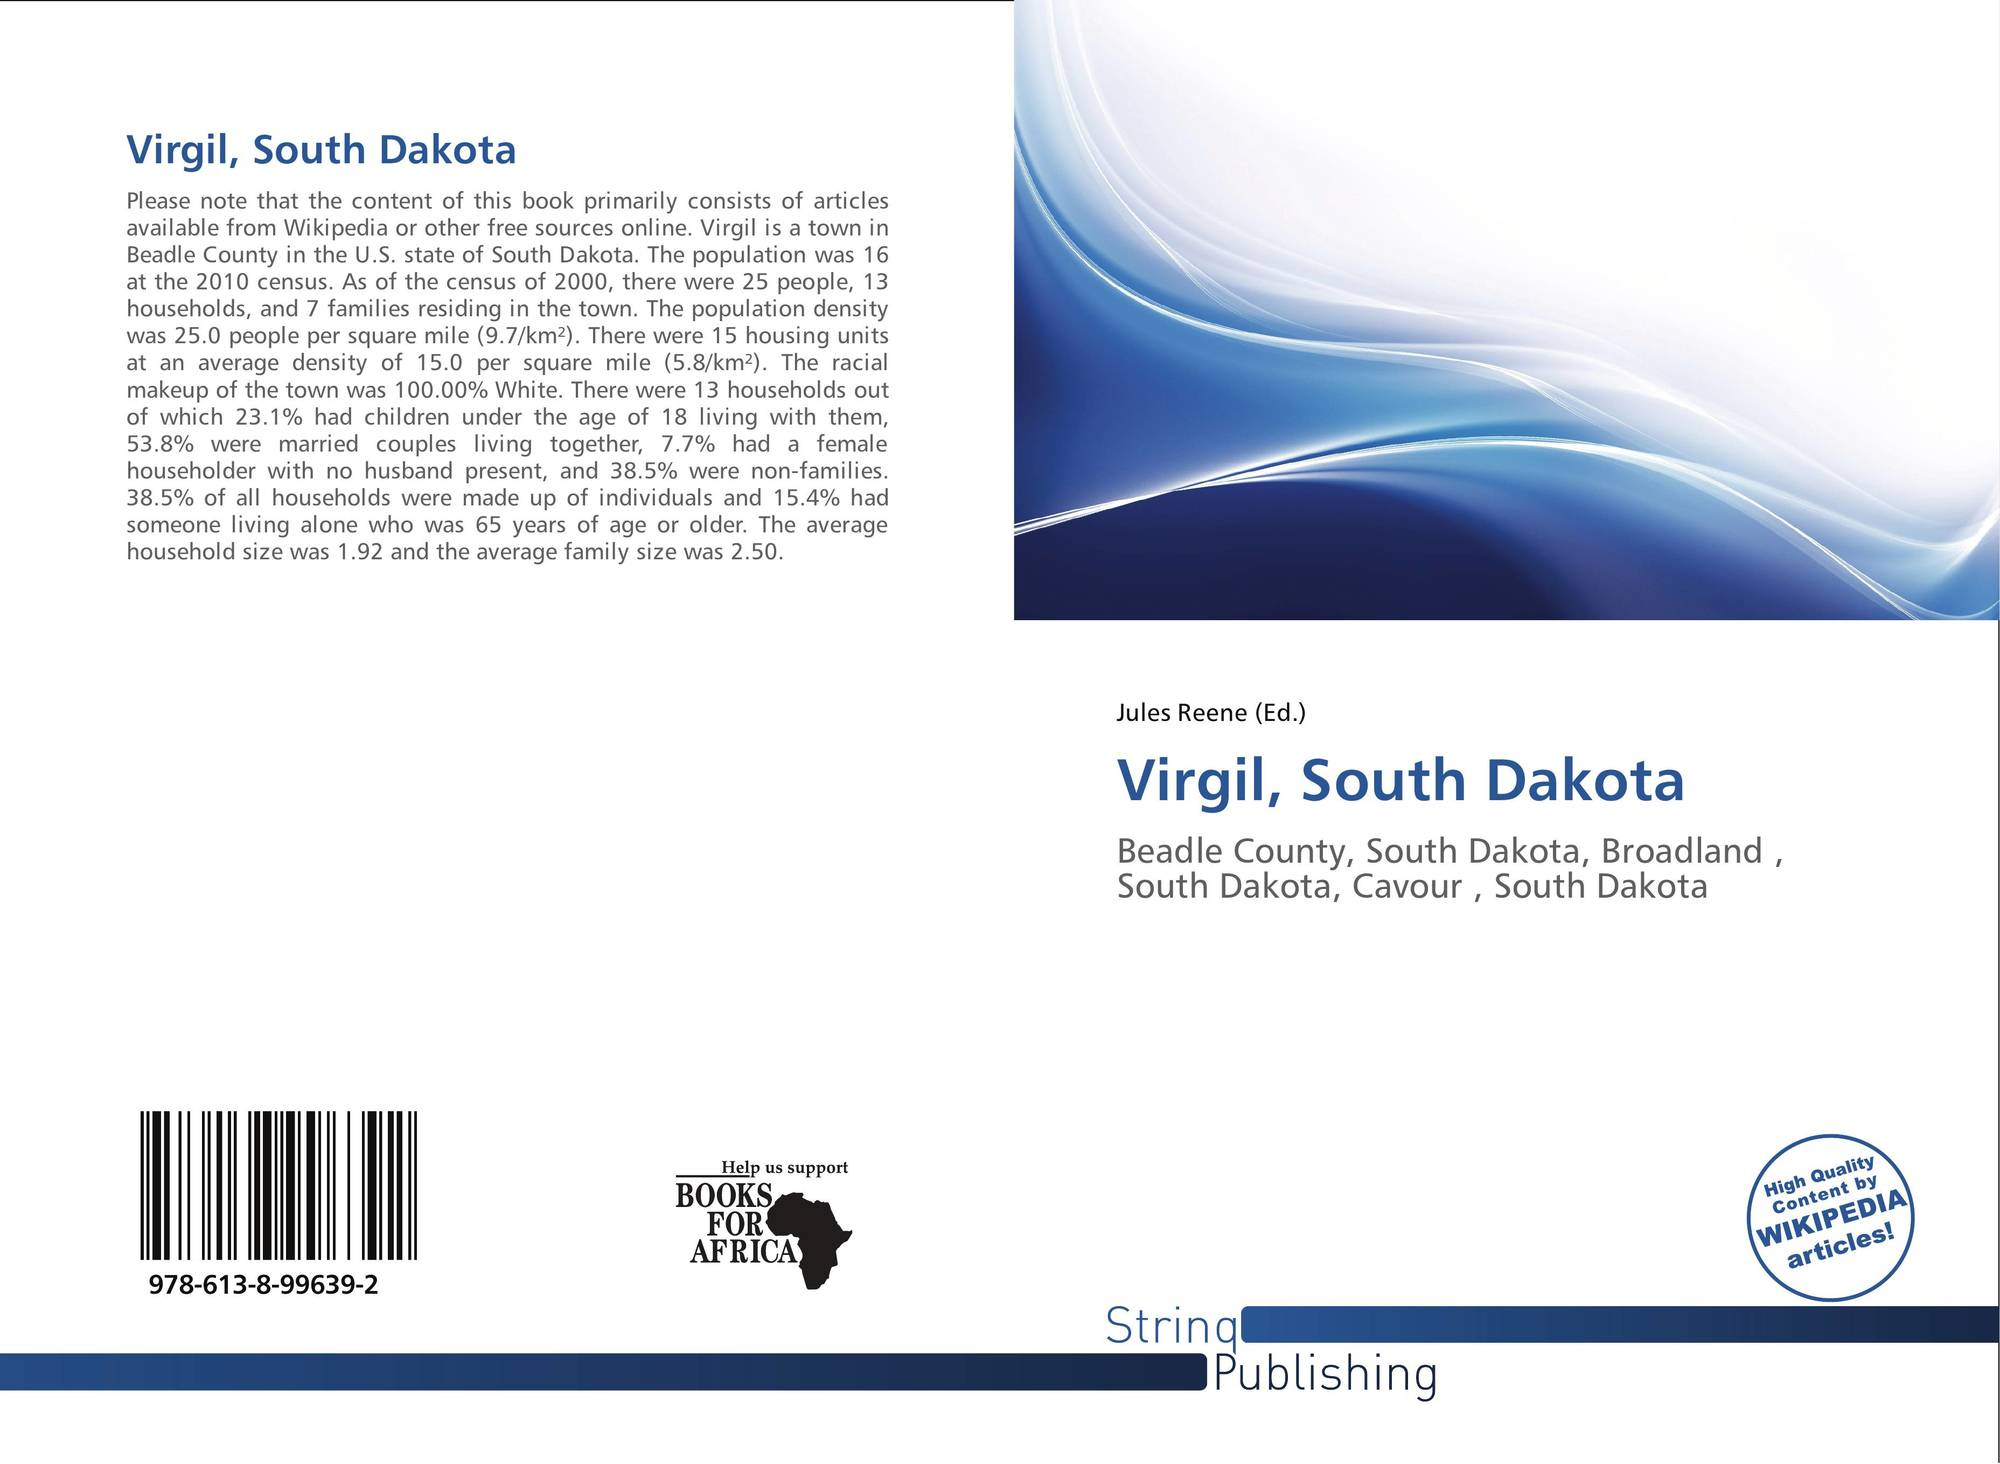 Dating Virgil South Dakota